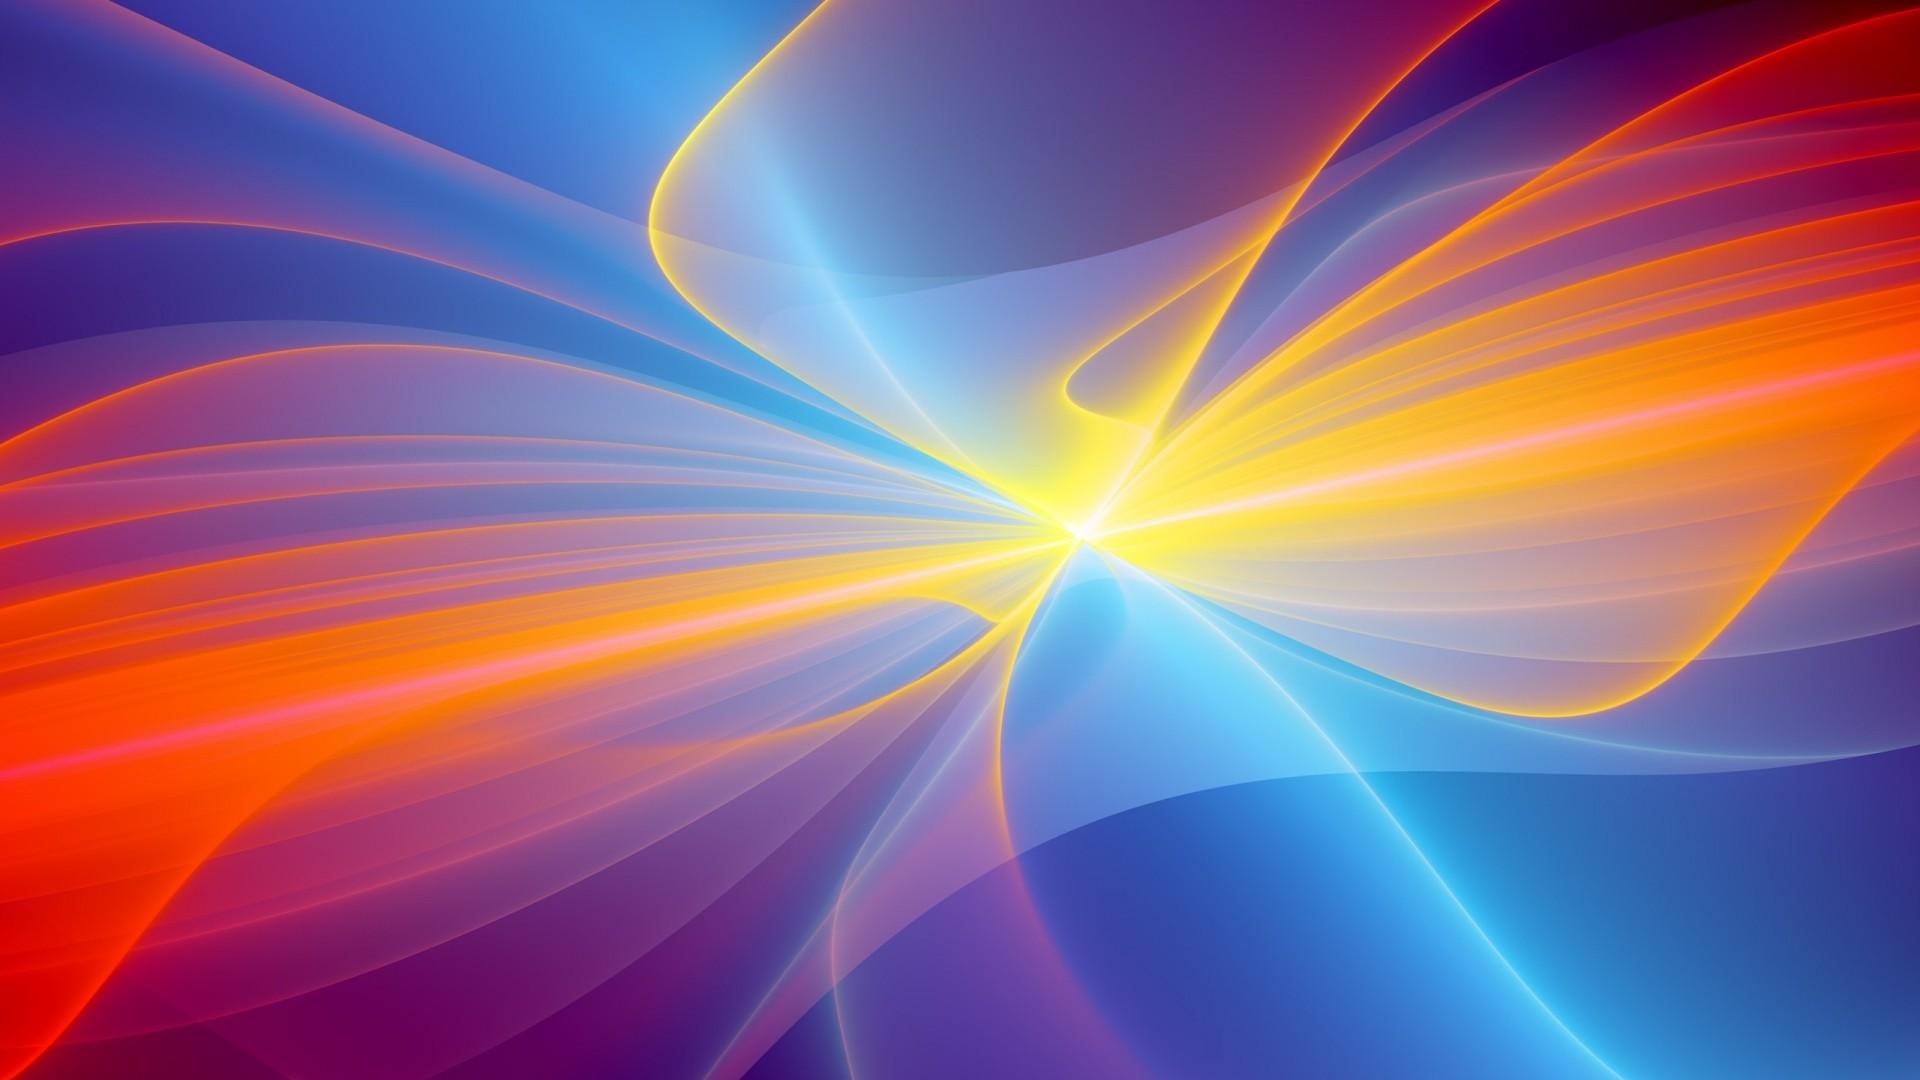 Wallpaper blue, yellow, red, smoke